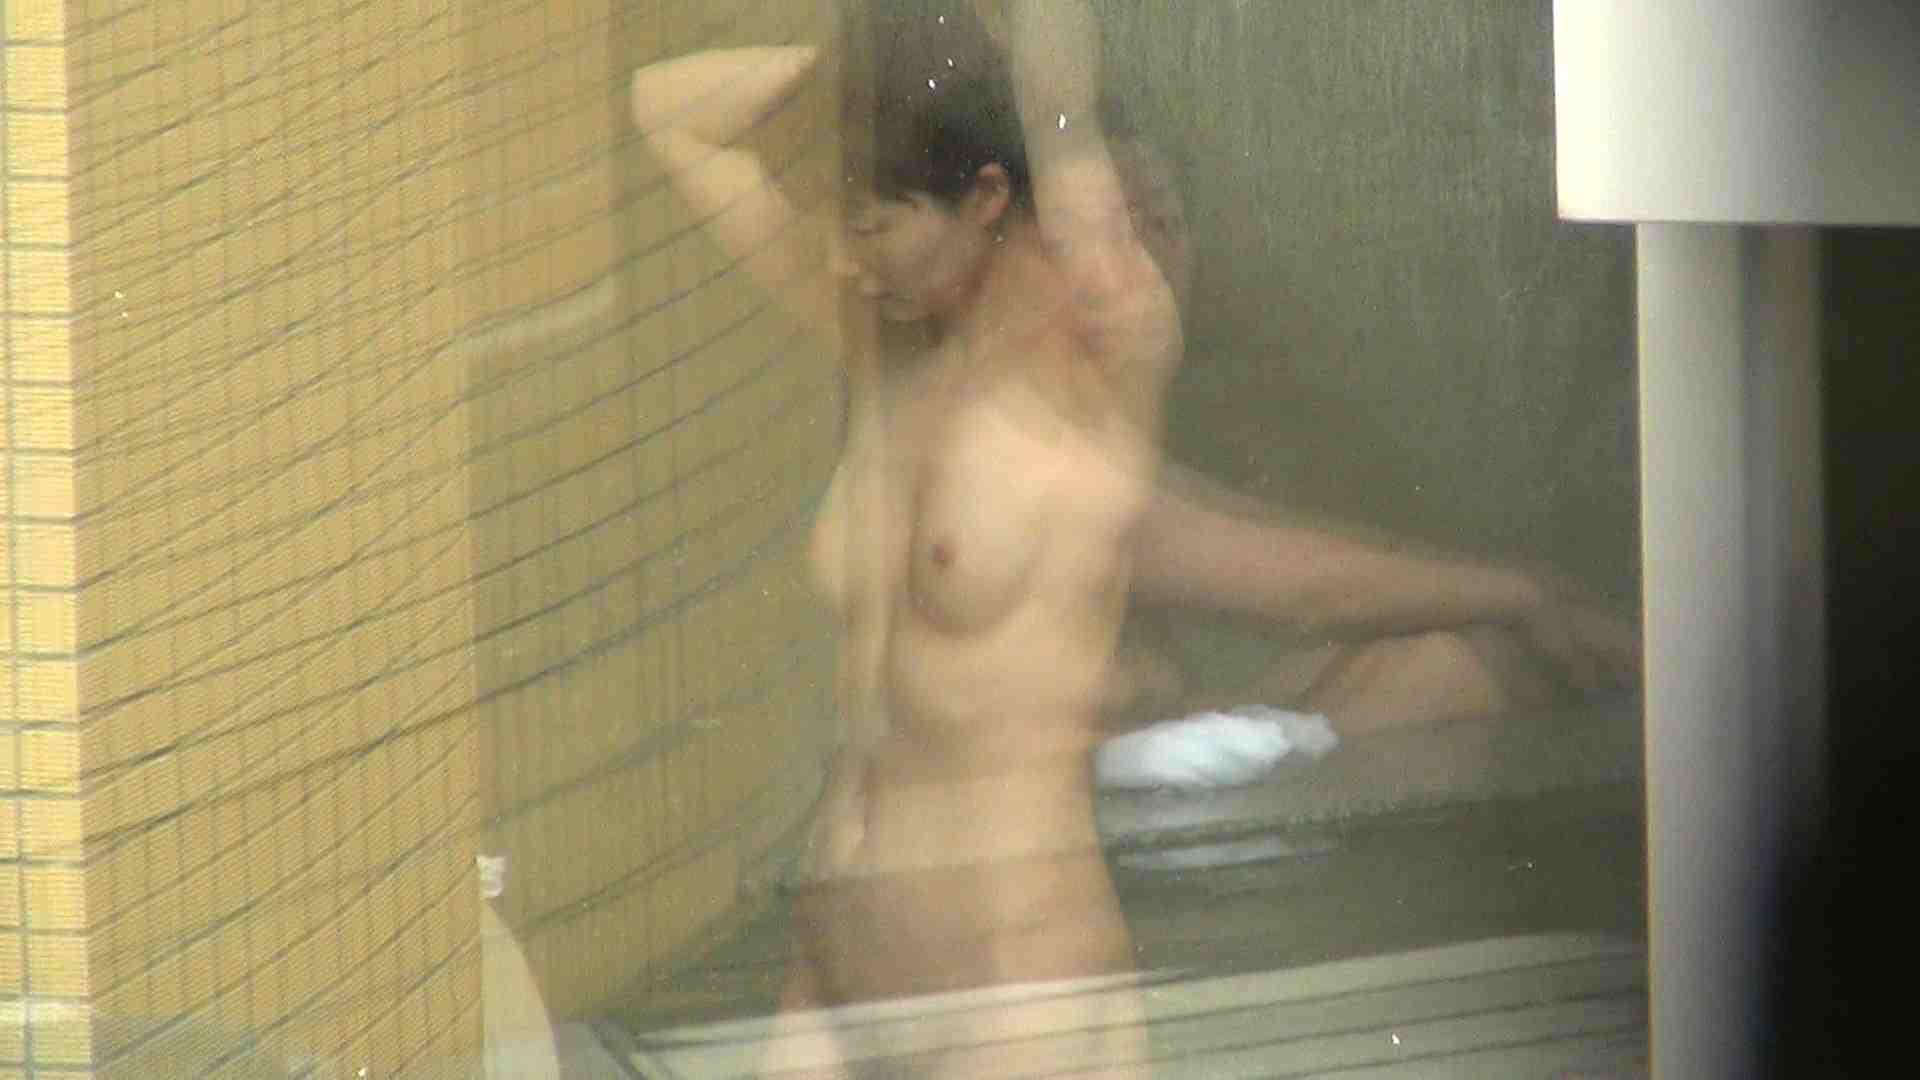 Aquaな露天風呂Vol.299 いやらしいOL オマンコ無修正動画無料 45連発 22